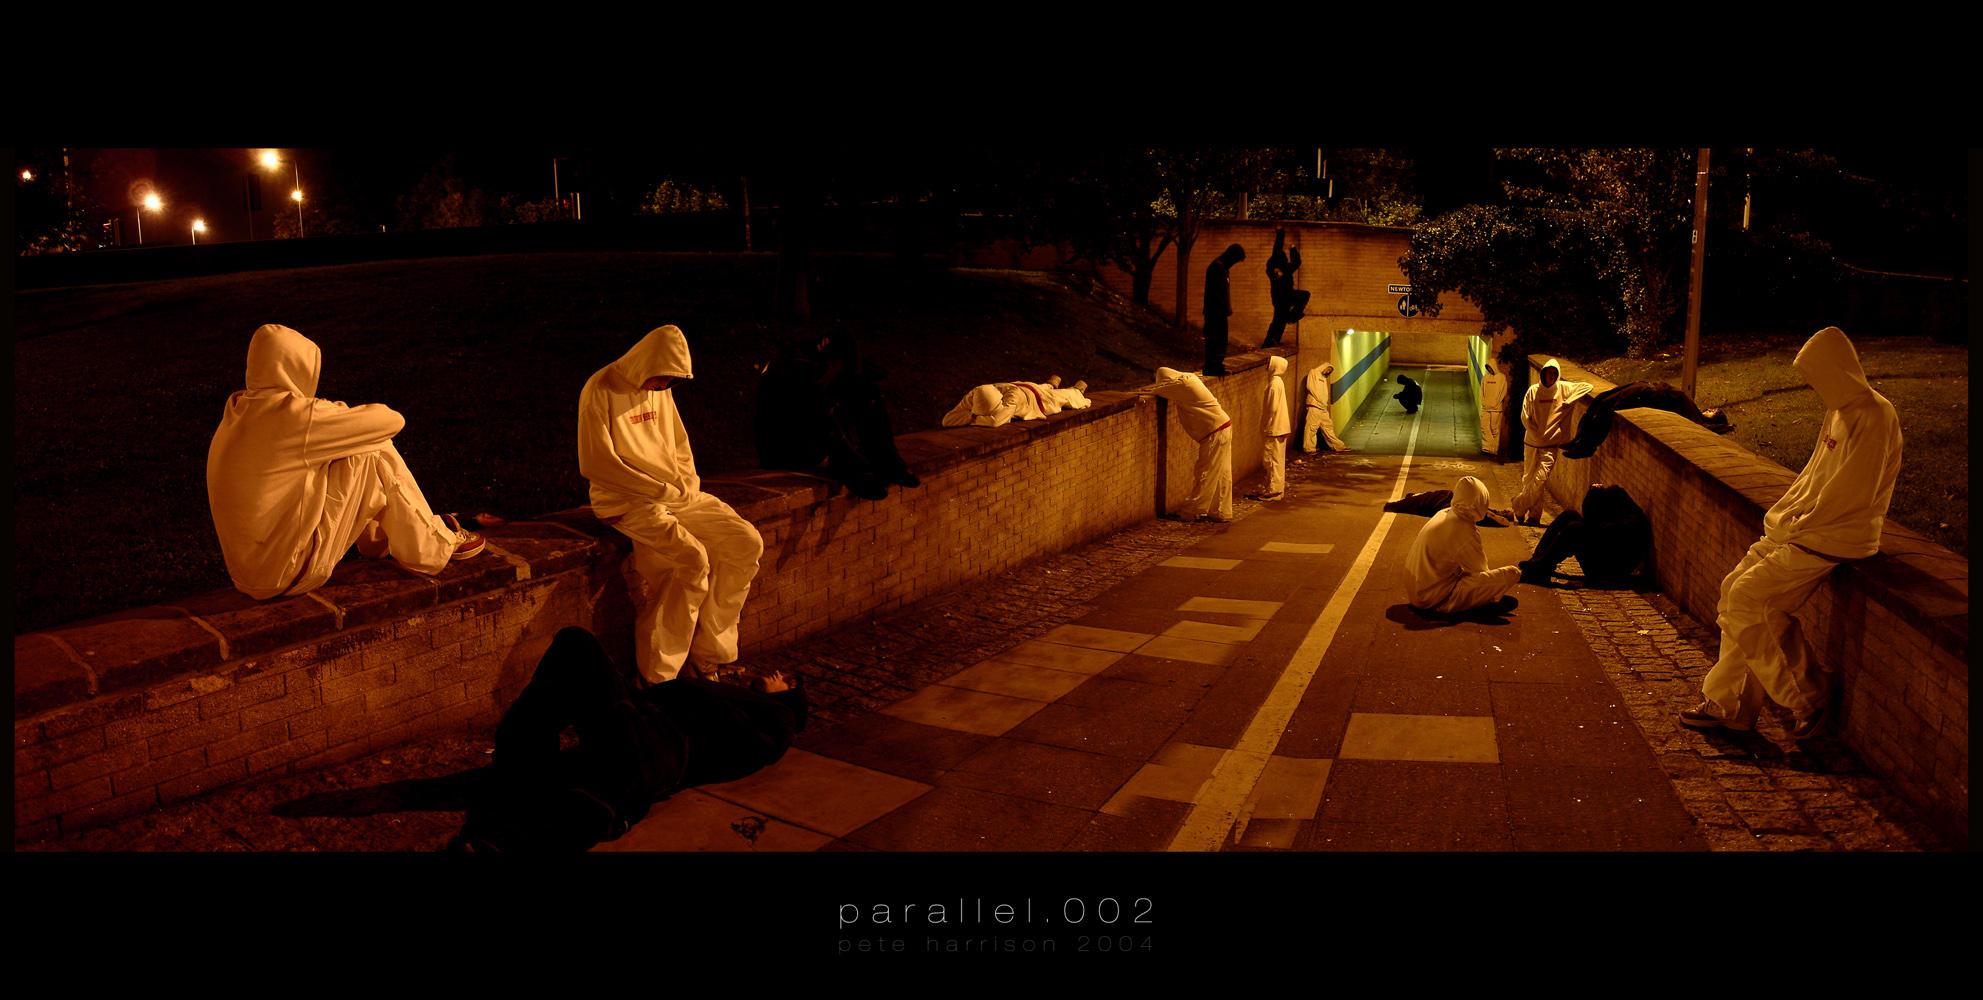 parallel.002 by pete-aeiko